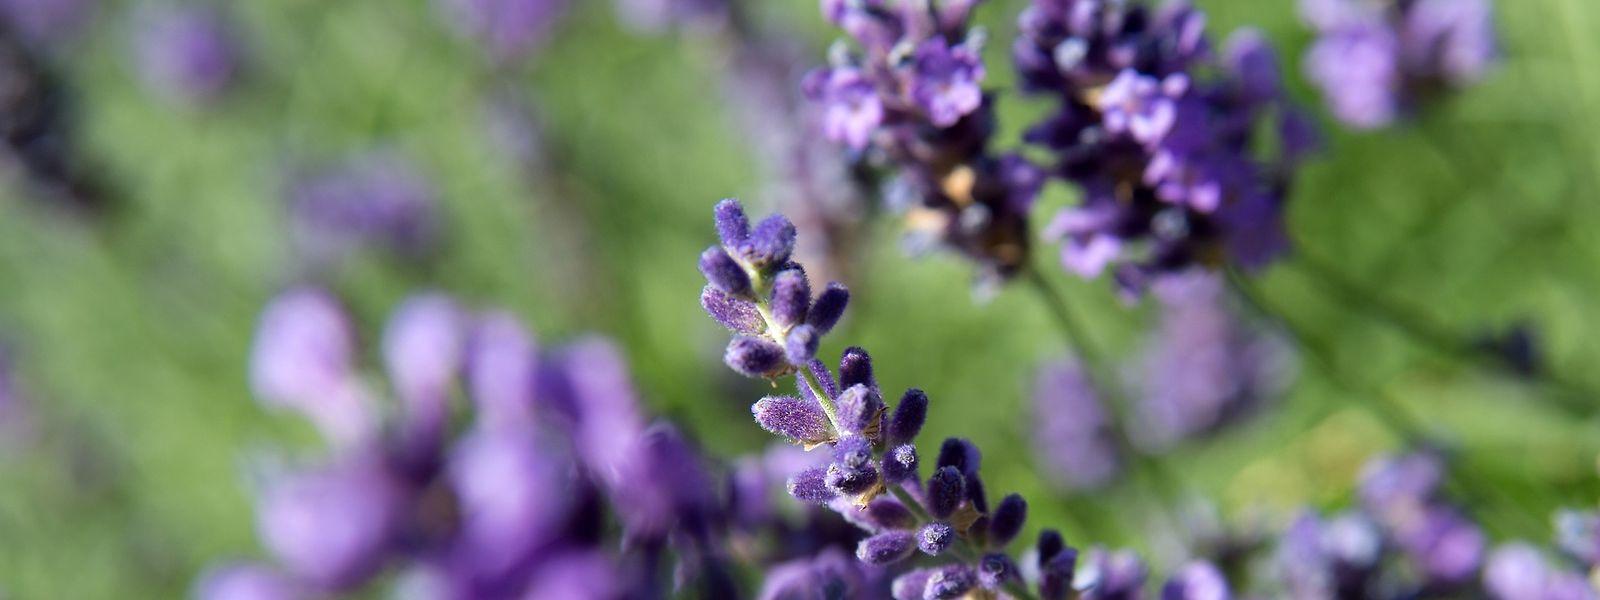 Lavendel hilft bei Kopfschmerzen.